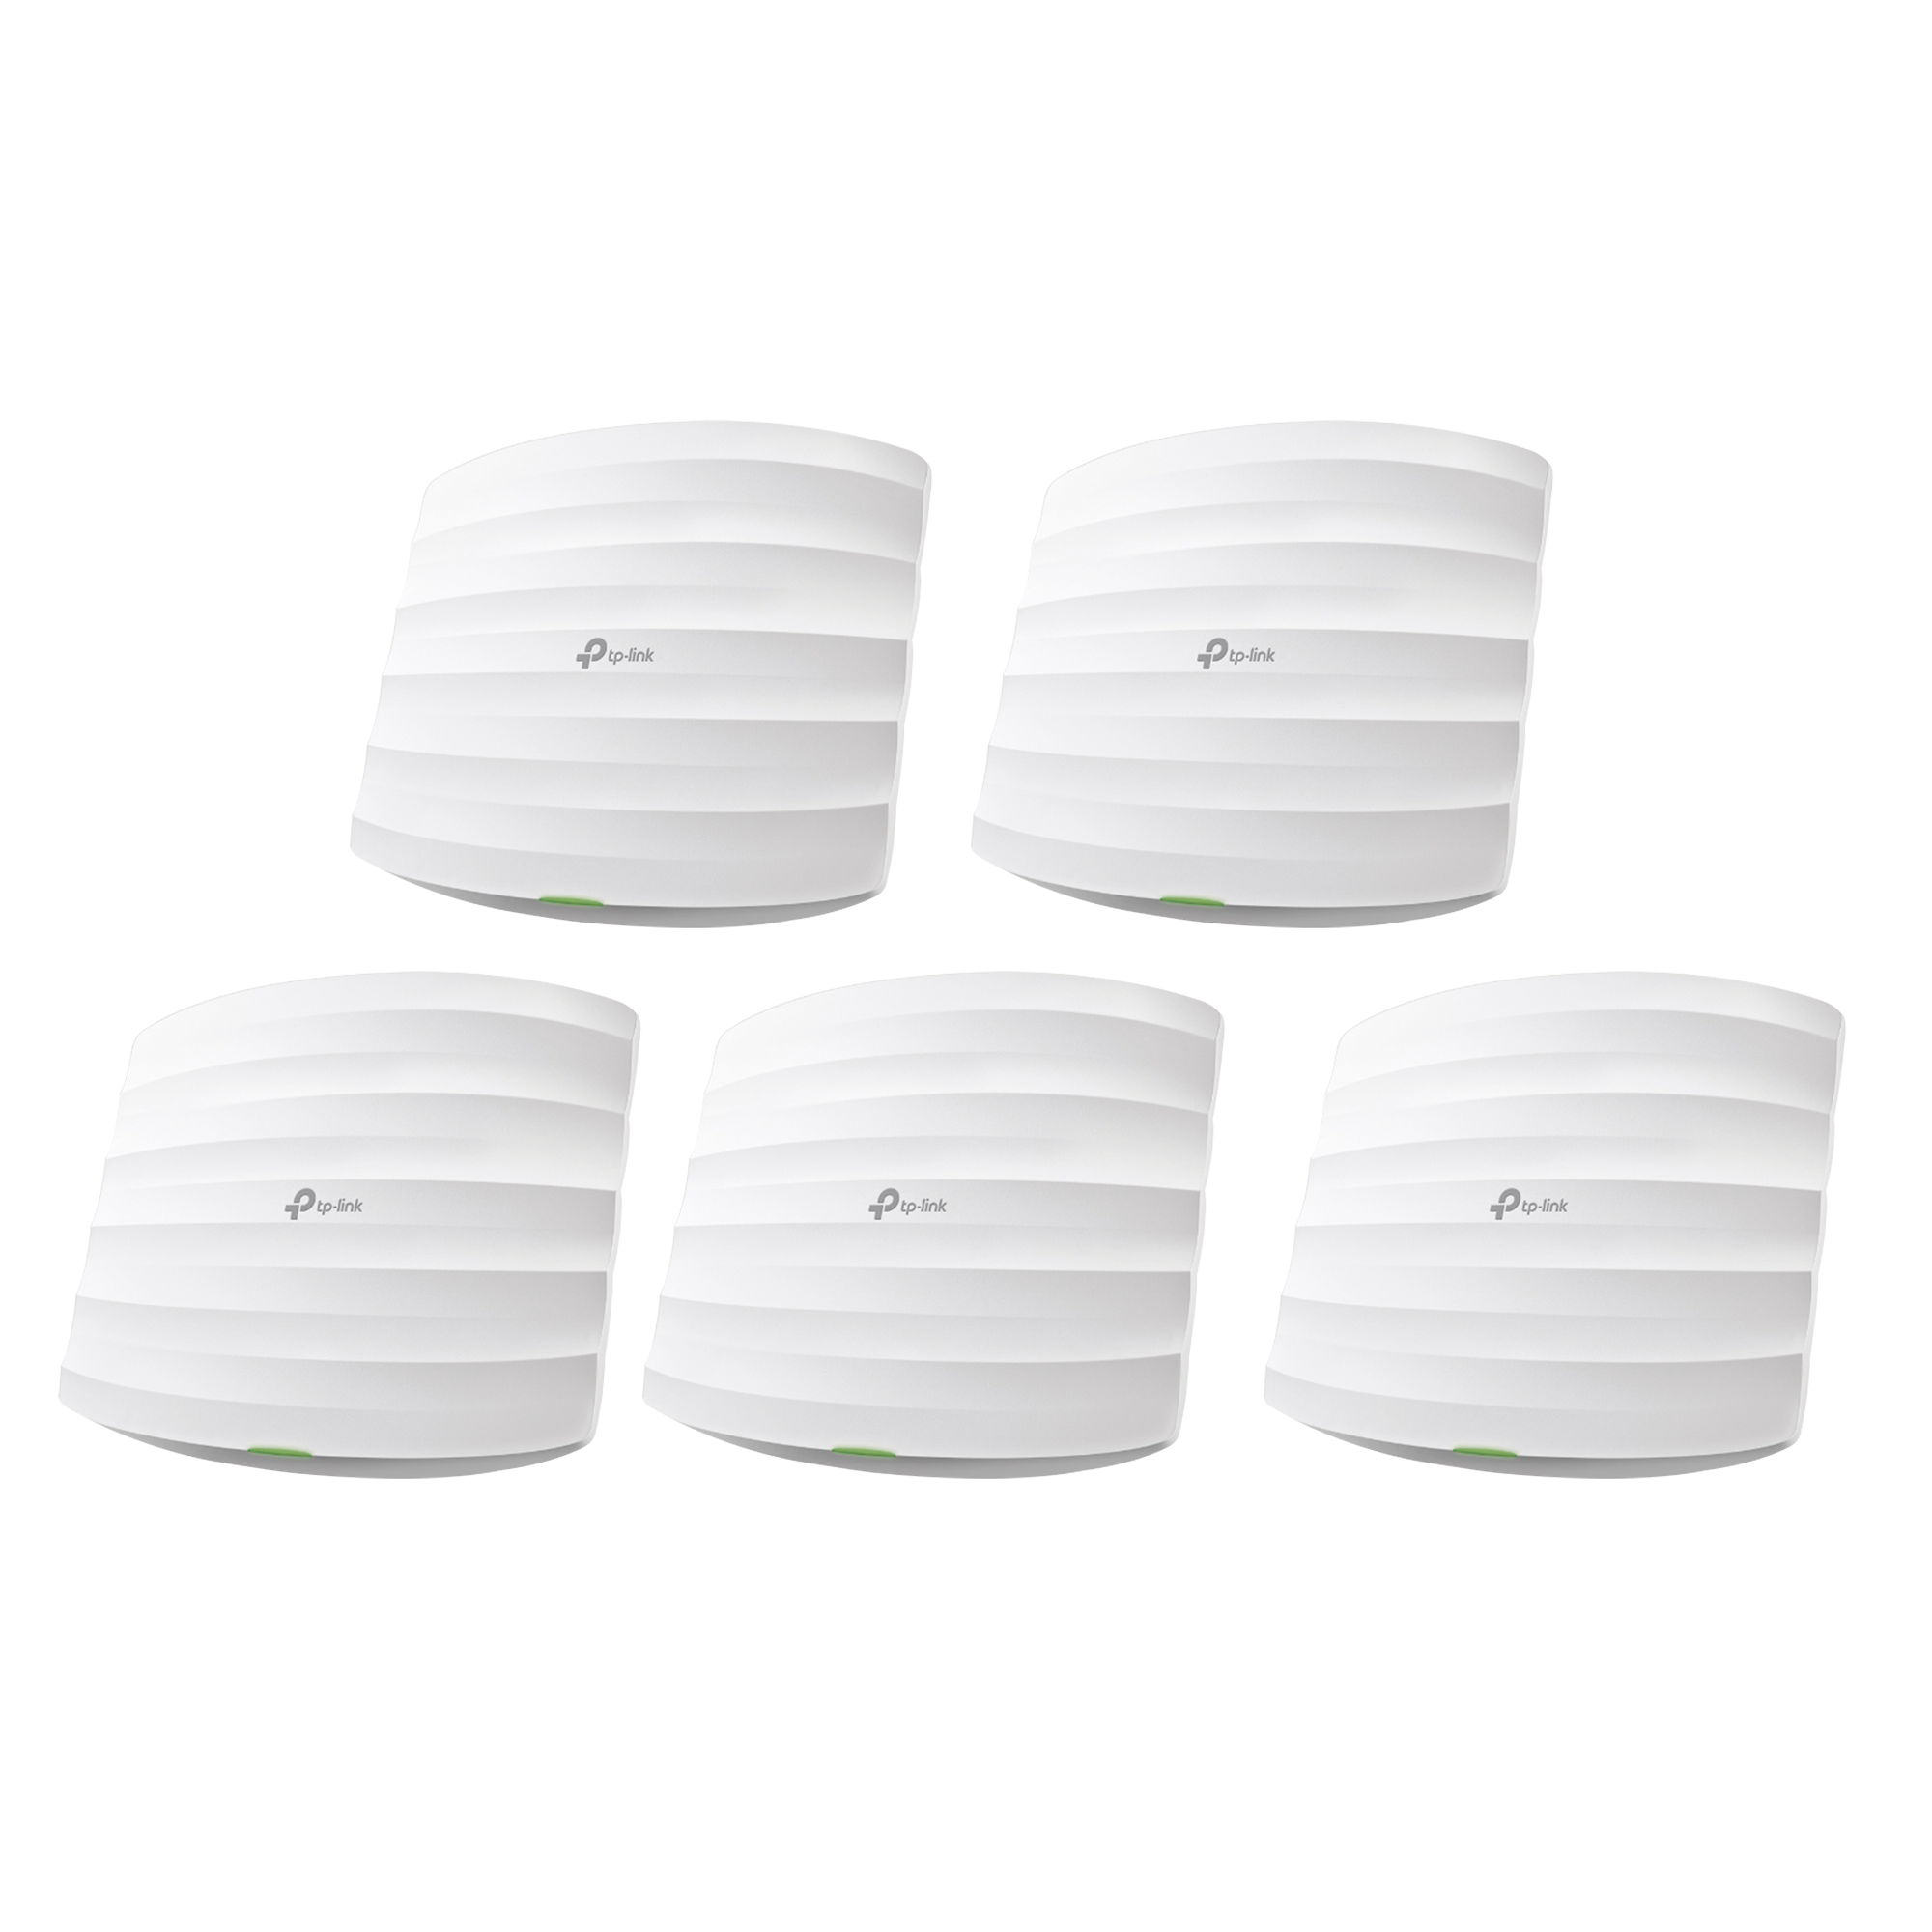 KIT de 5 Puntos de Acceso Omada, 802.11 b/g/n (2.4 GHz), hasta 300 Mbps, alimentación PoE pasivo, para montaje en techo, soporta hasta 50 clientes.